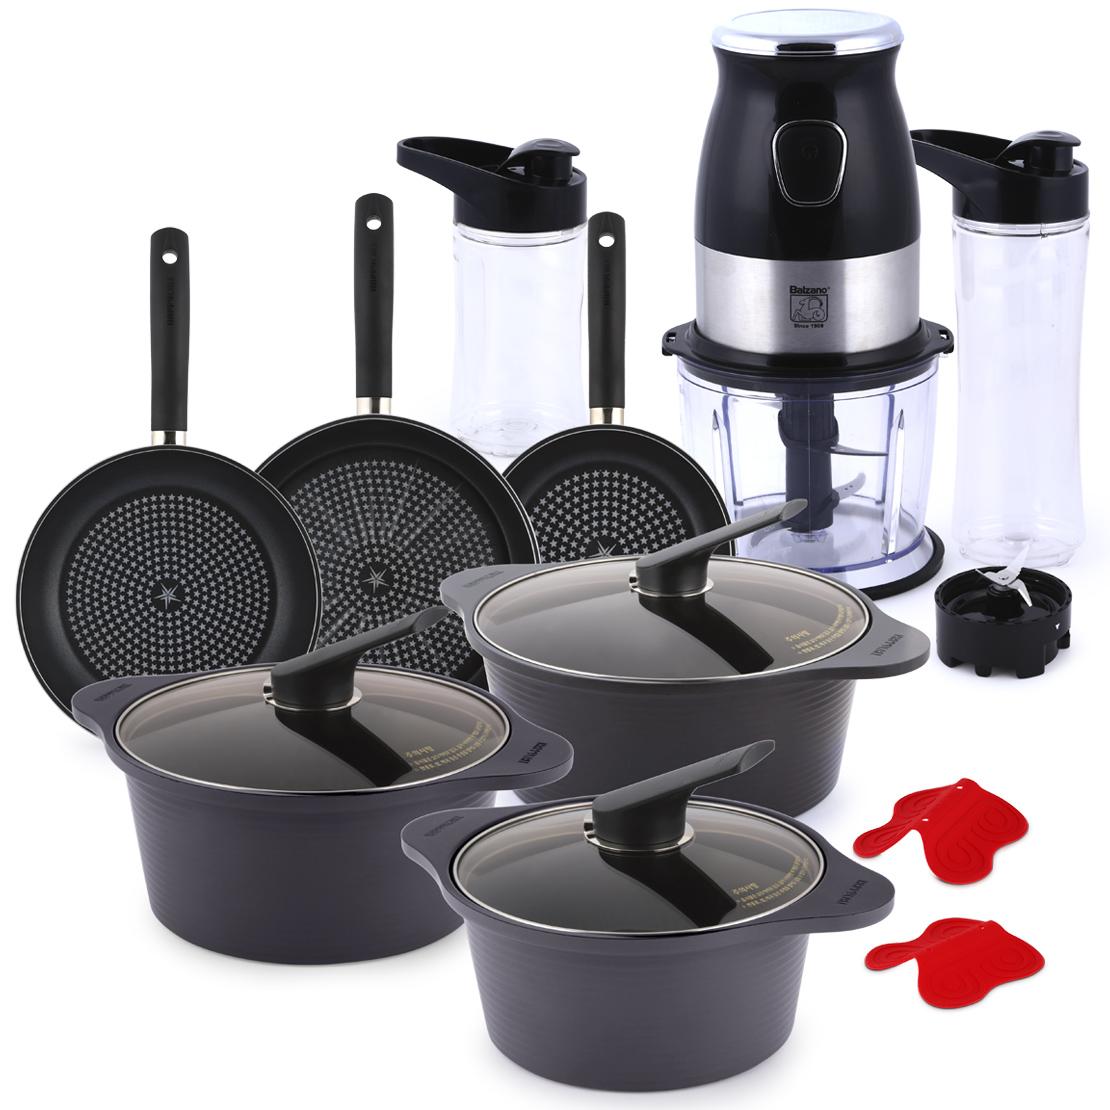 10 Piece Cookware Set & 3 in 1 Blender